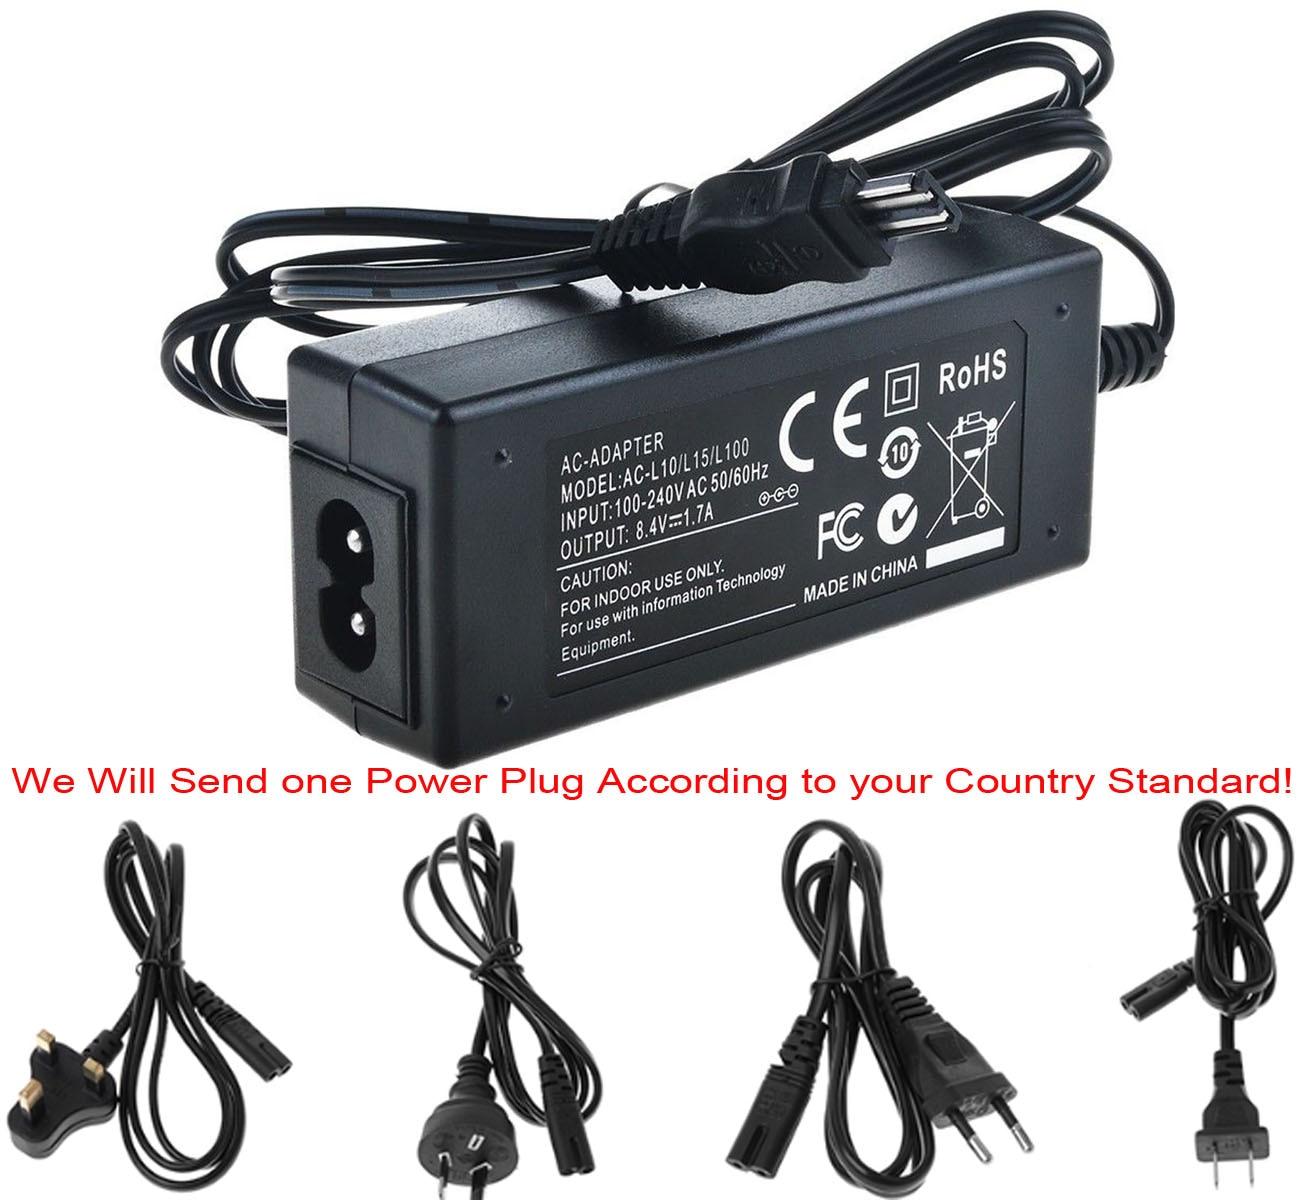 HDR-AX2000 Handycam Camcorder DCR-VX2200 AC Adapter Power Supply for Sony DCR-VX2000 DCR-VX2100